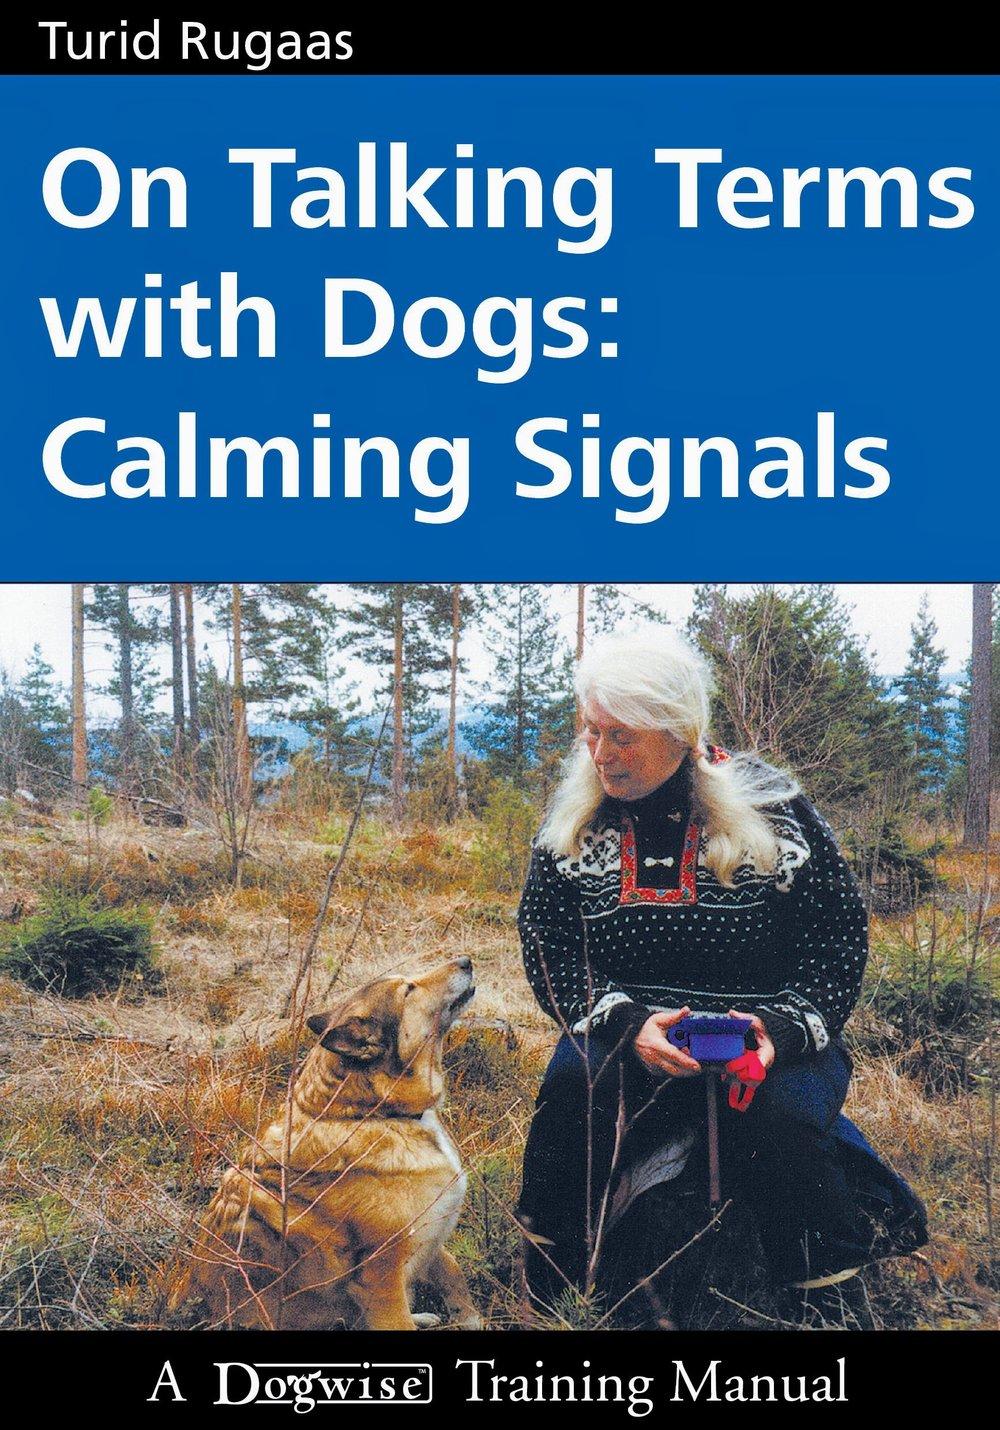 turid-rugass-dog-training